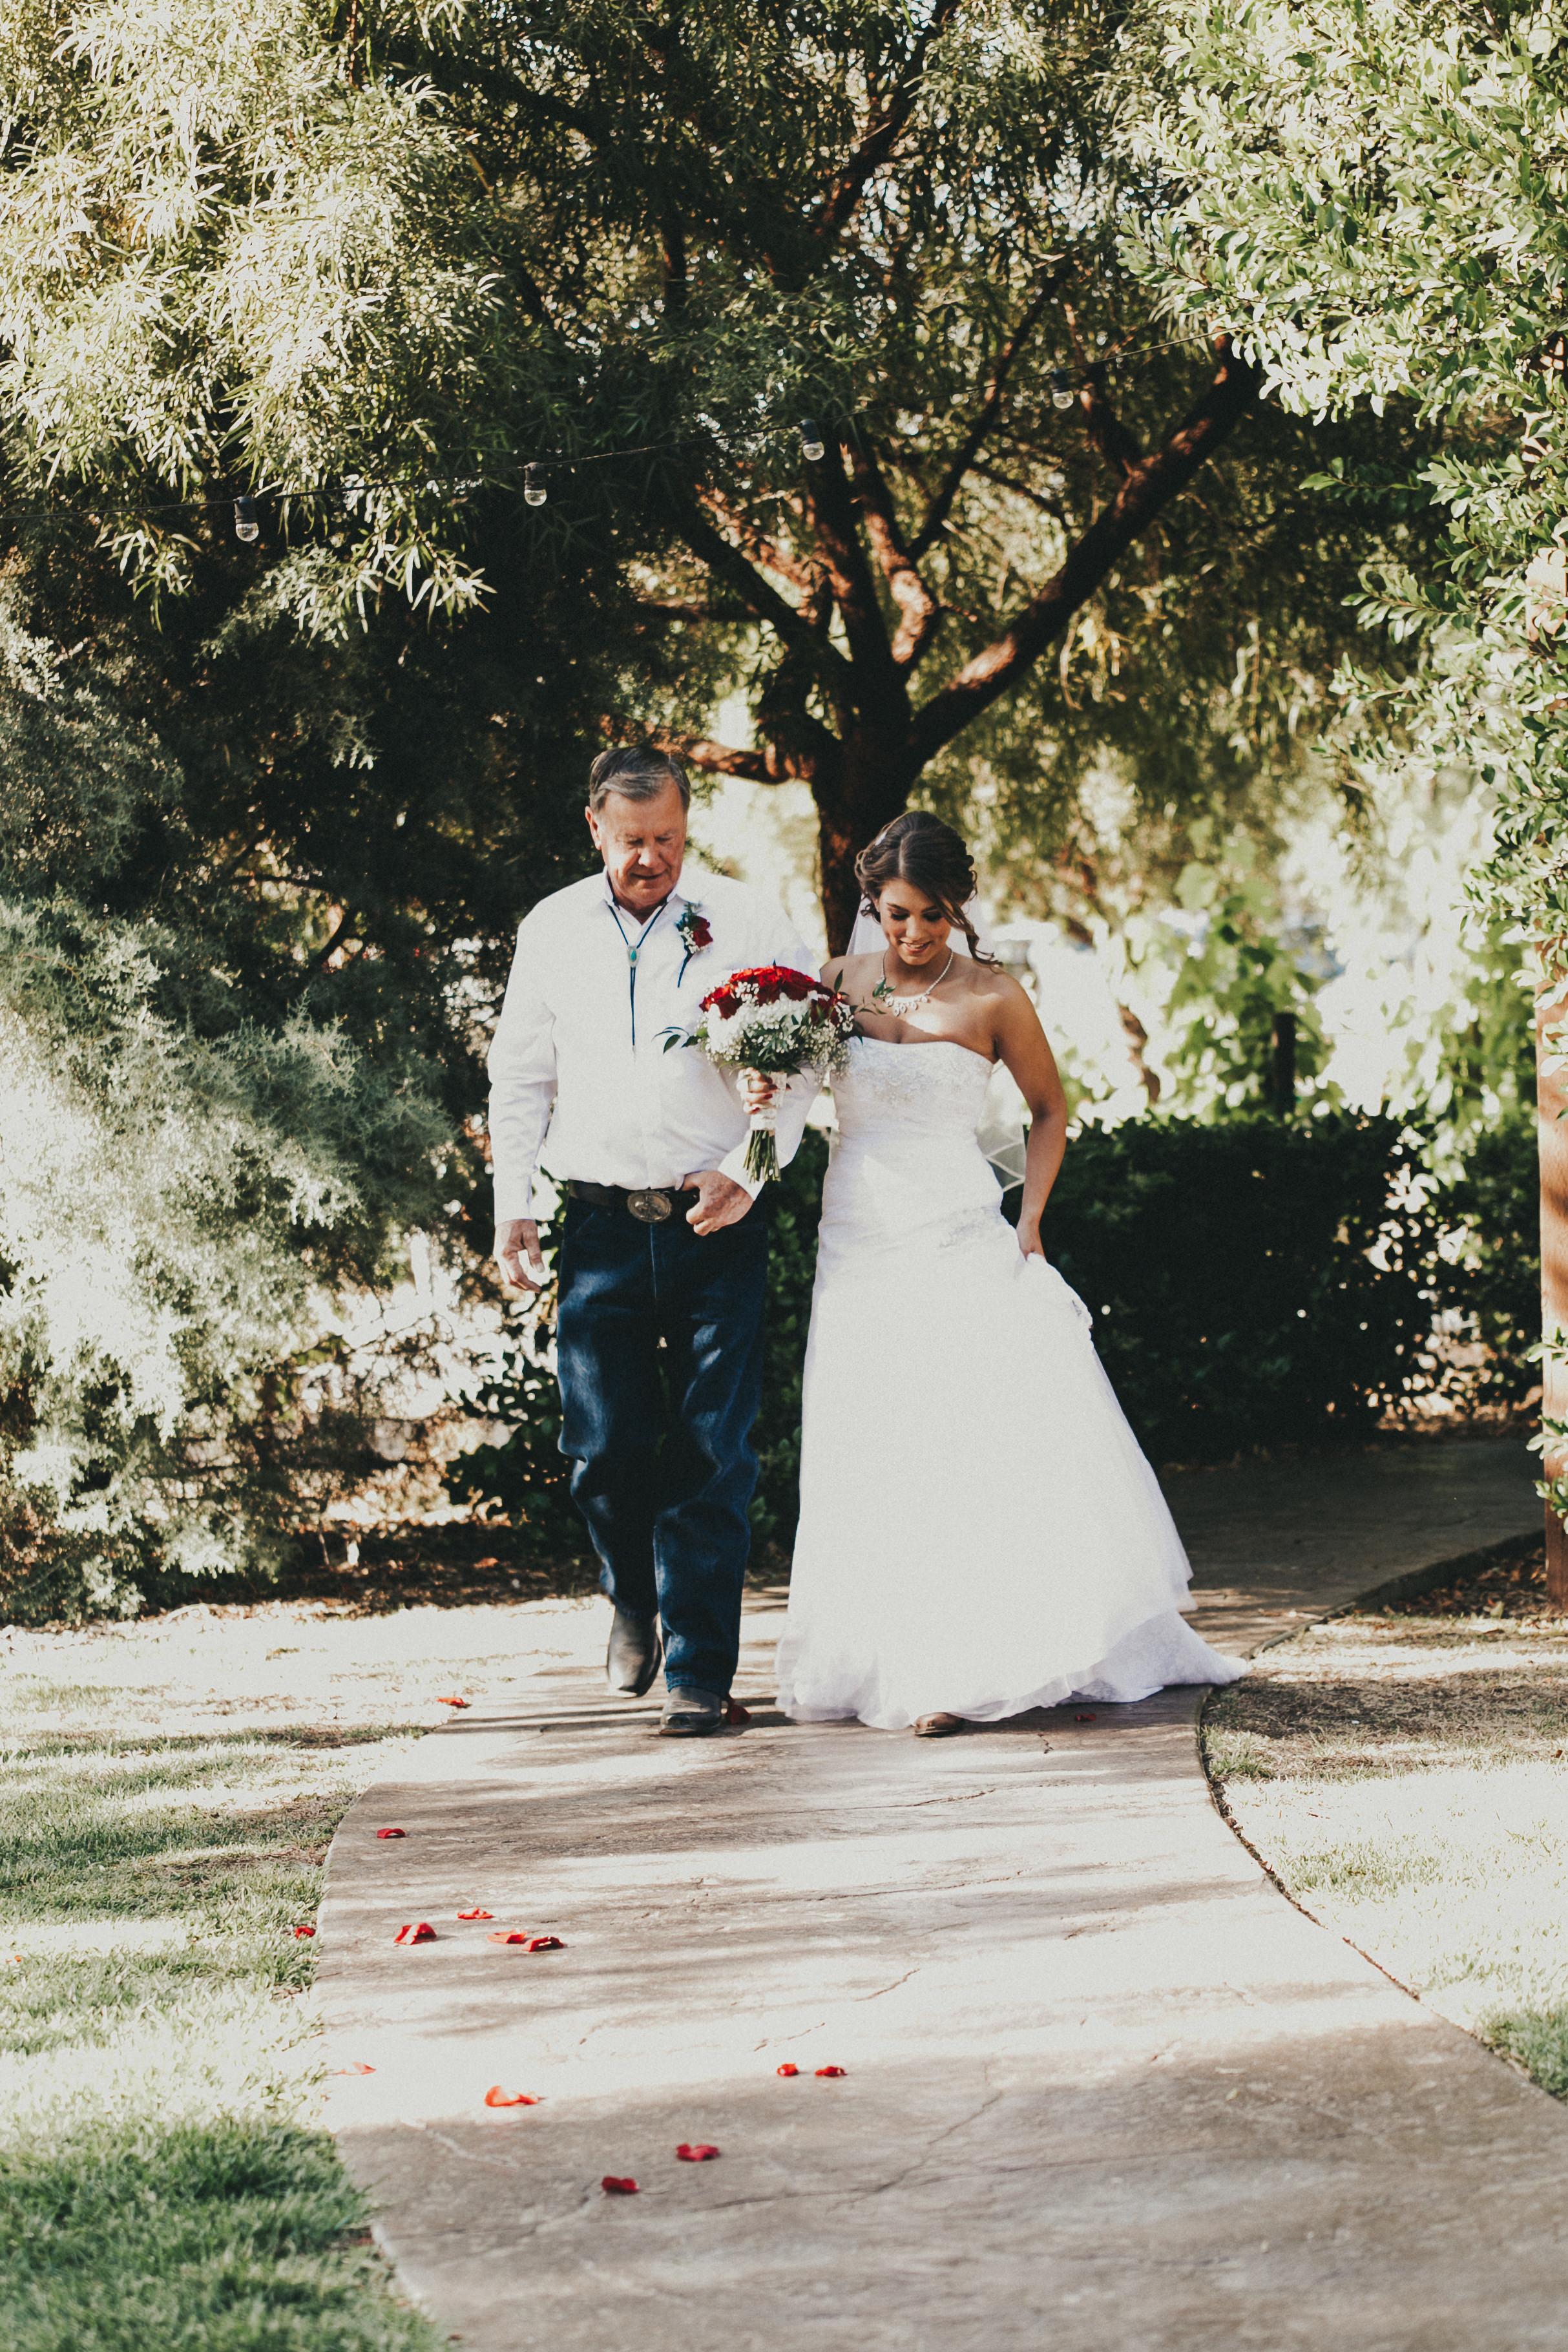 Cheyenne + Jordan - Wedding, Natalie Griffo (46 of 157).jpg